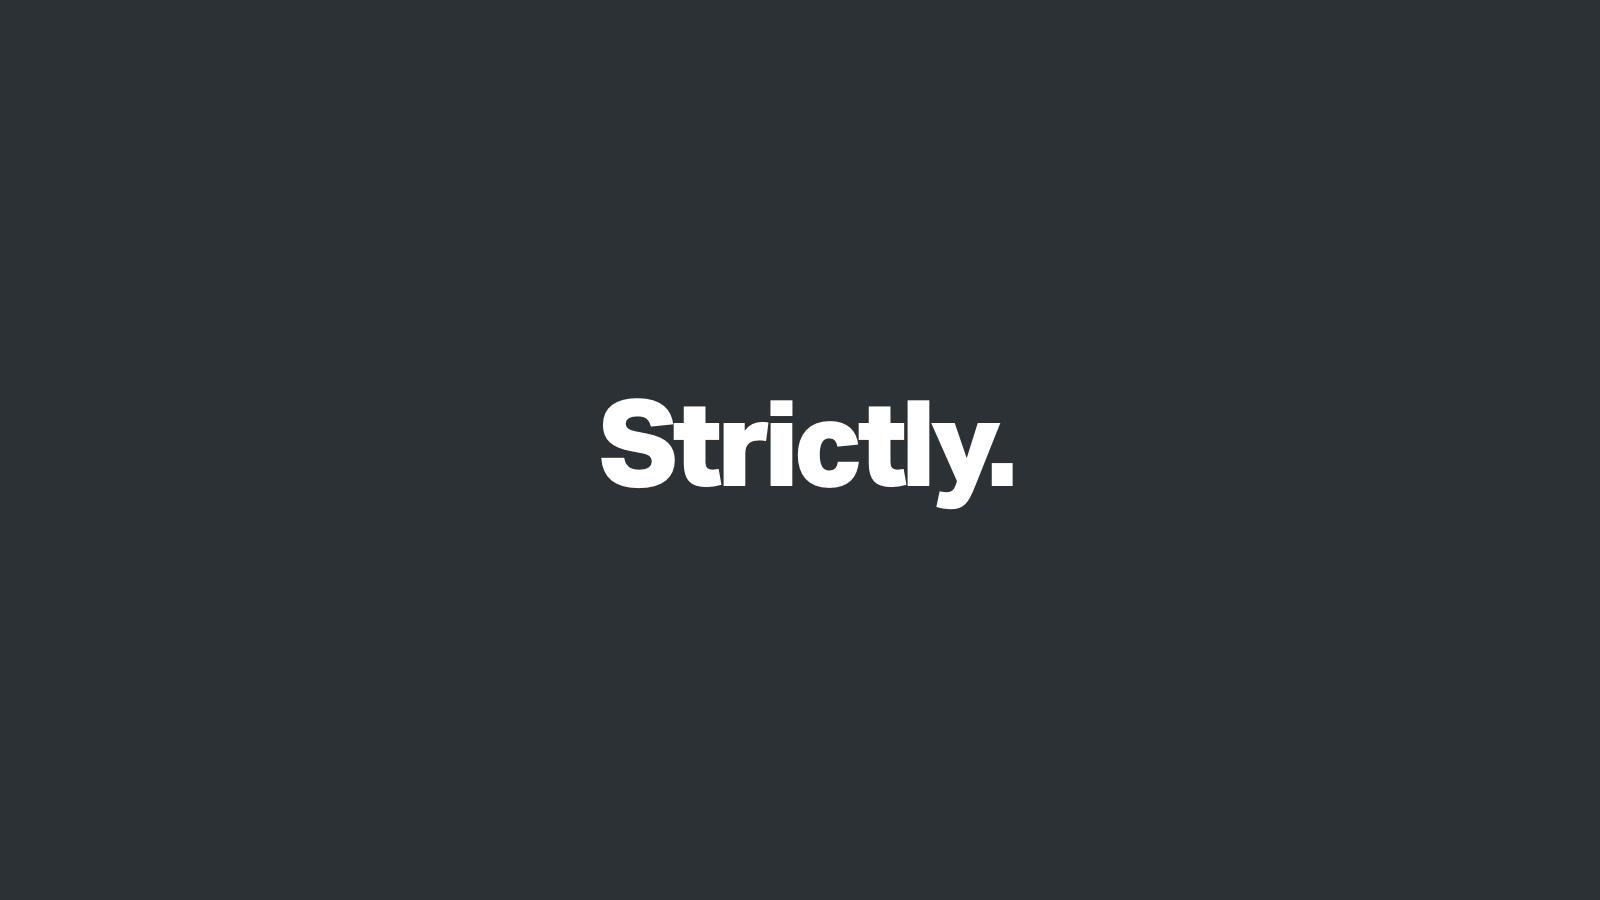 strictly_ph_black_2